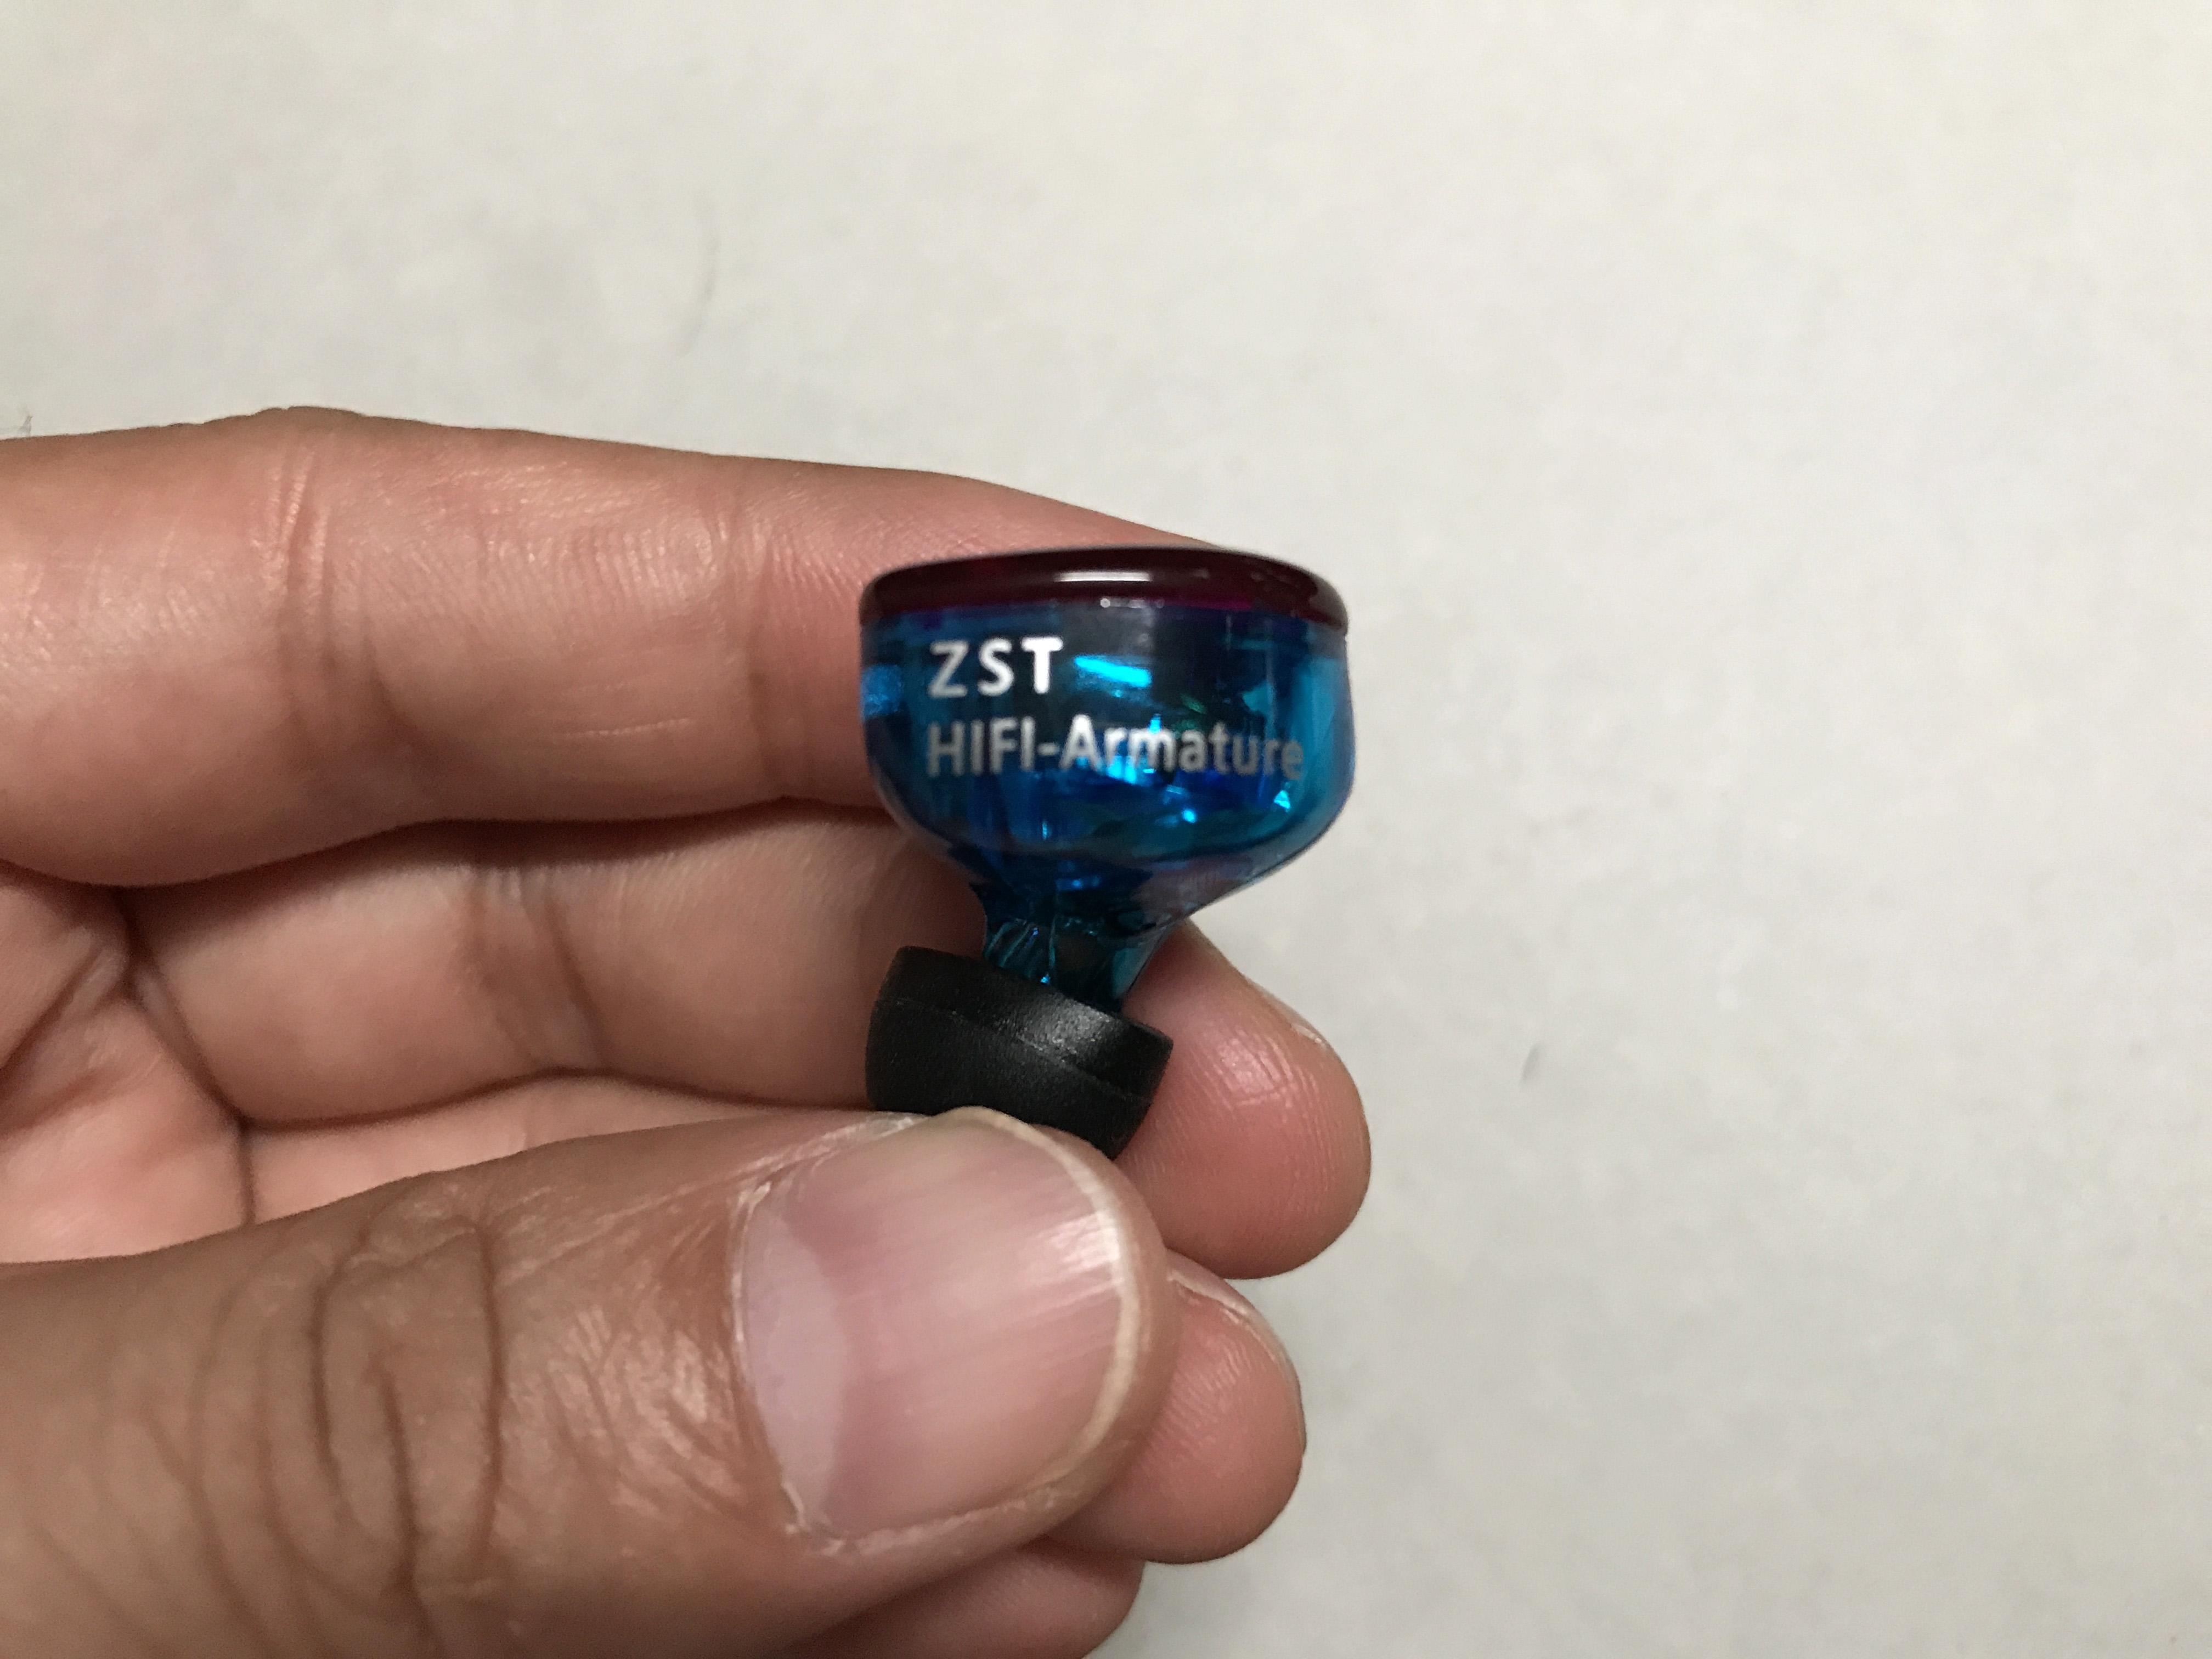 KZ ZST ハイブリッドドライバイヤホン 1BA+1DD 高性能インイヤーイヤホン音質がいい